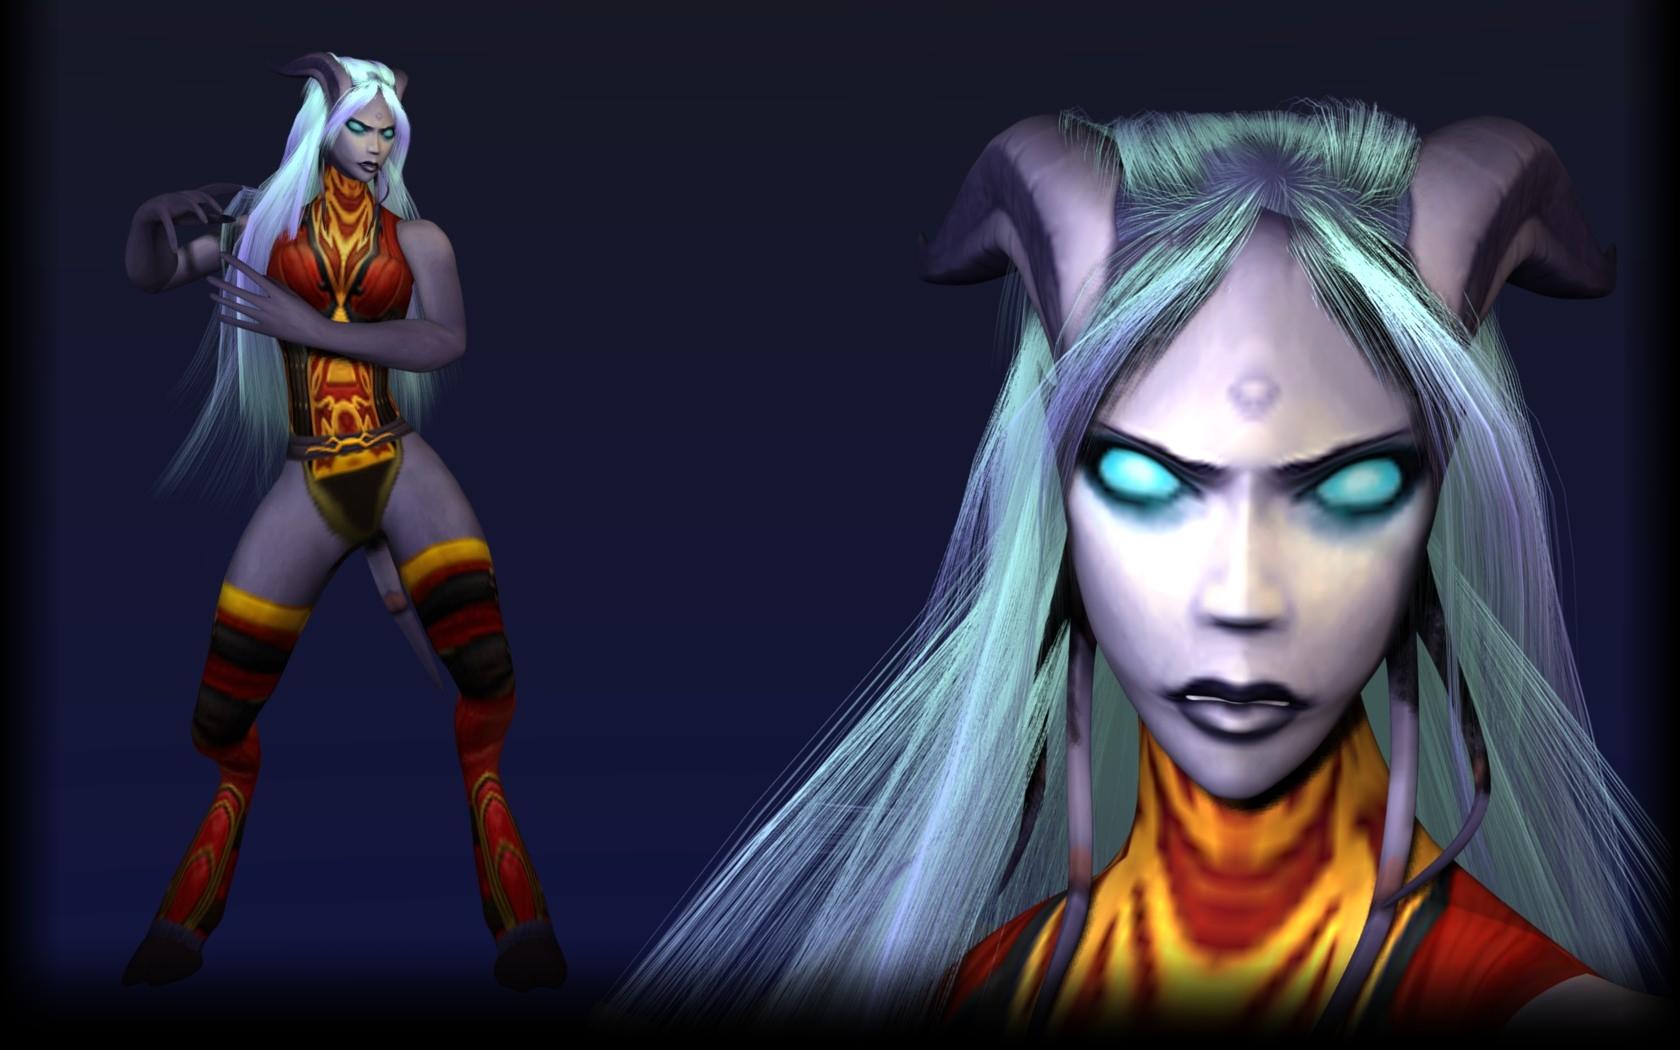 [49+] World of Warcraft Draenei Wallpaper on WallpaperSafari